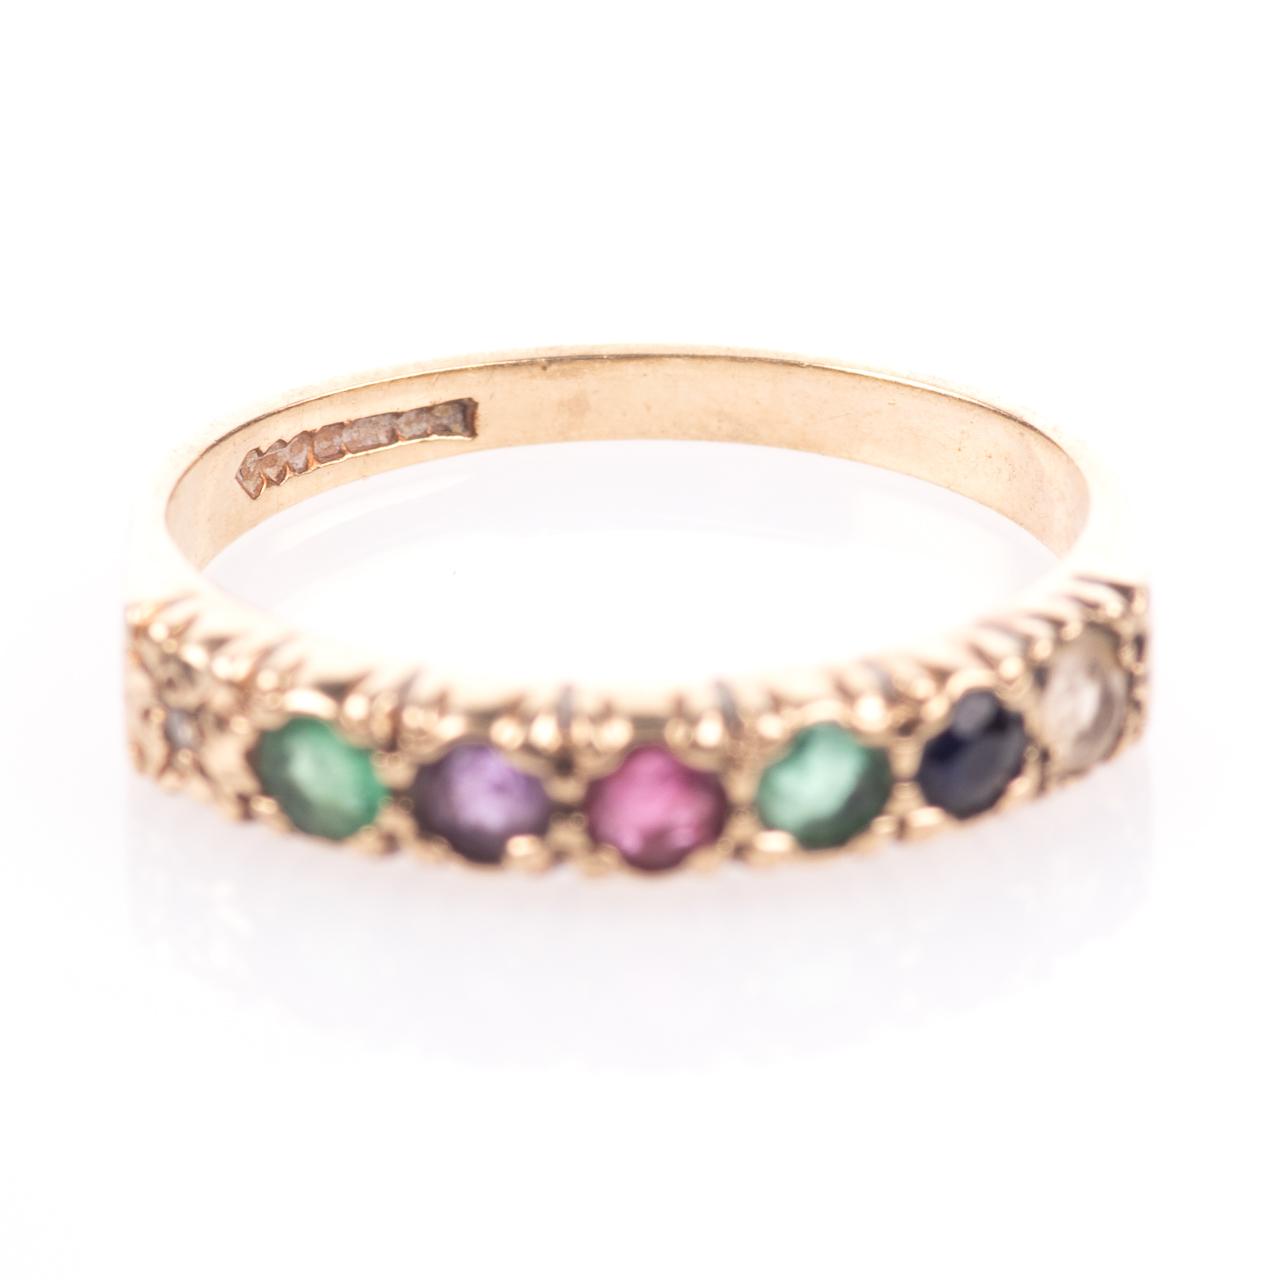 9ct Gold Emerald, Ruby, Amethyst, Sapphire & Diamond Ring - Image 4 of 8